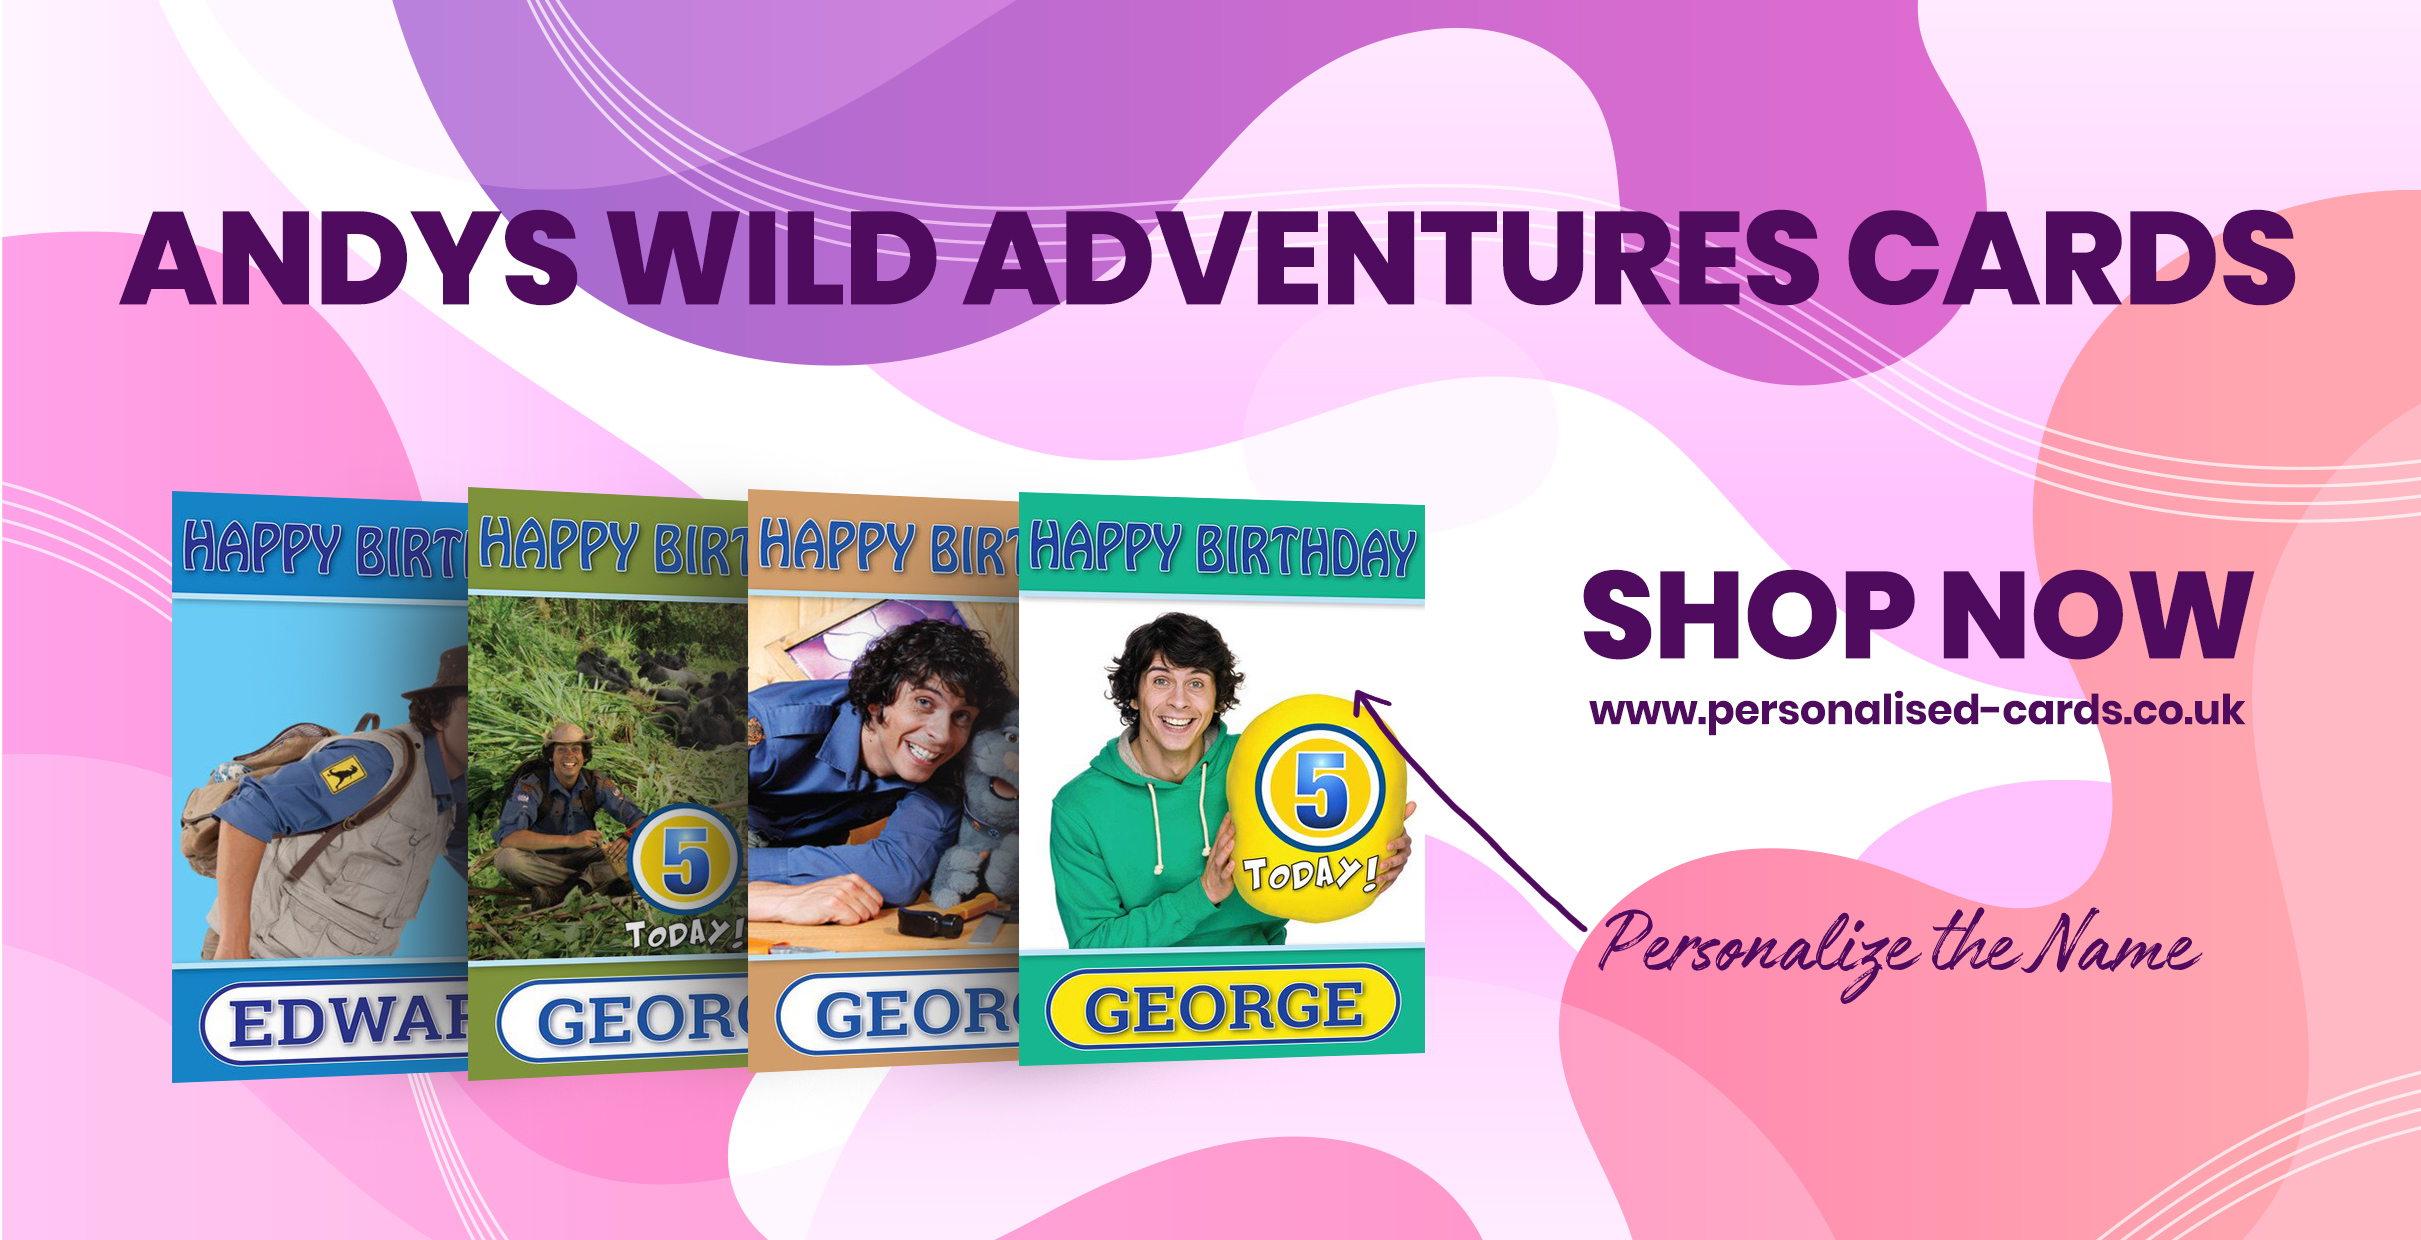 andys-wild-adventures-cards.jpg